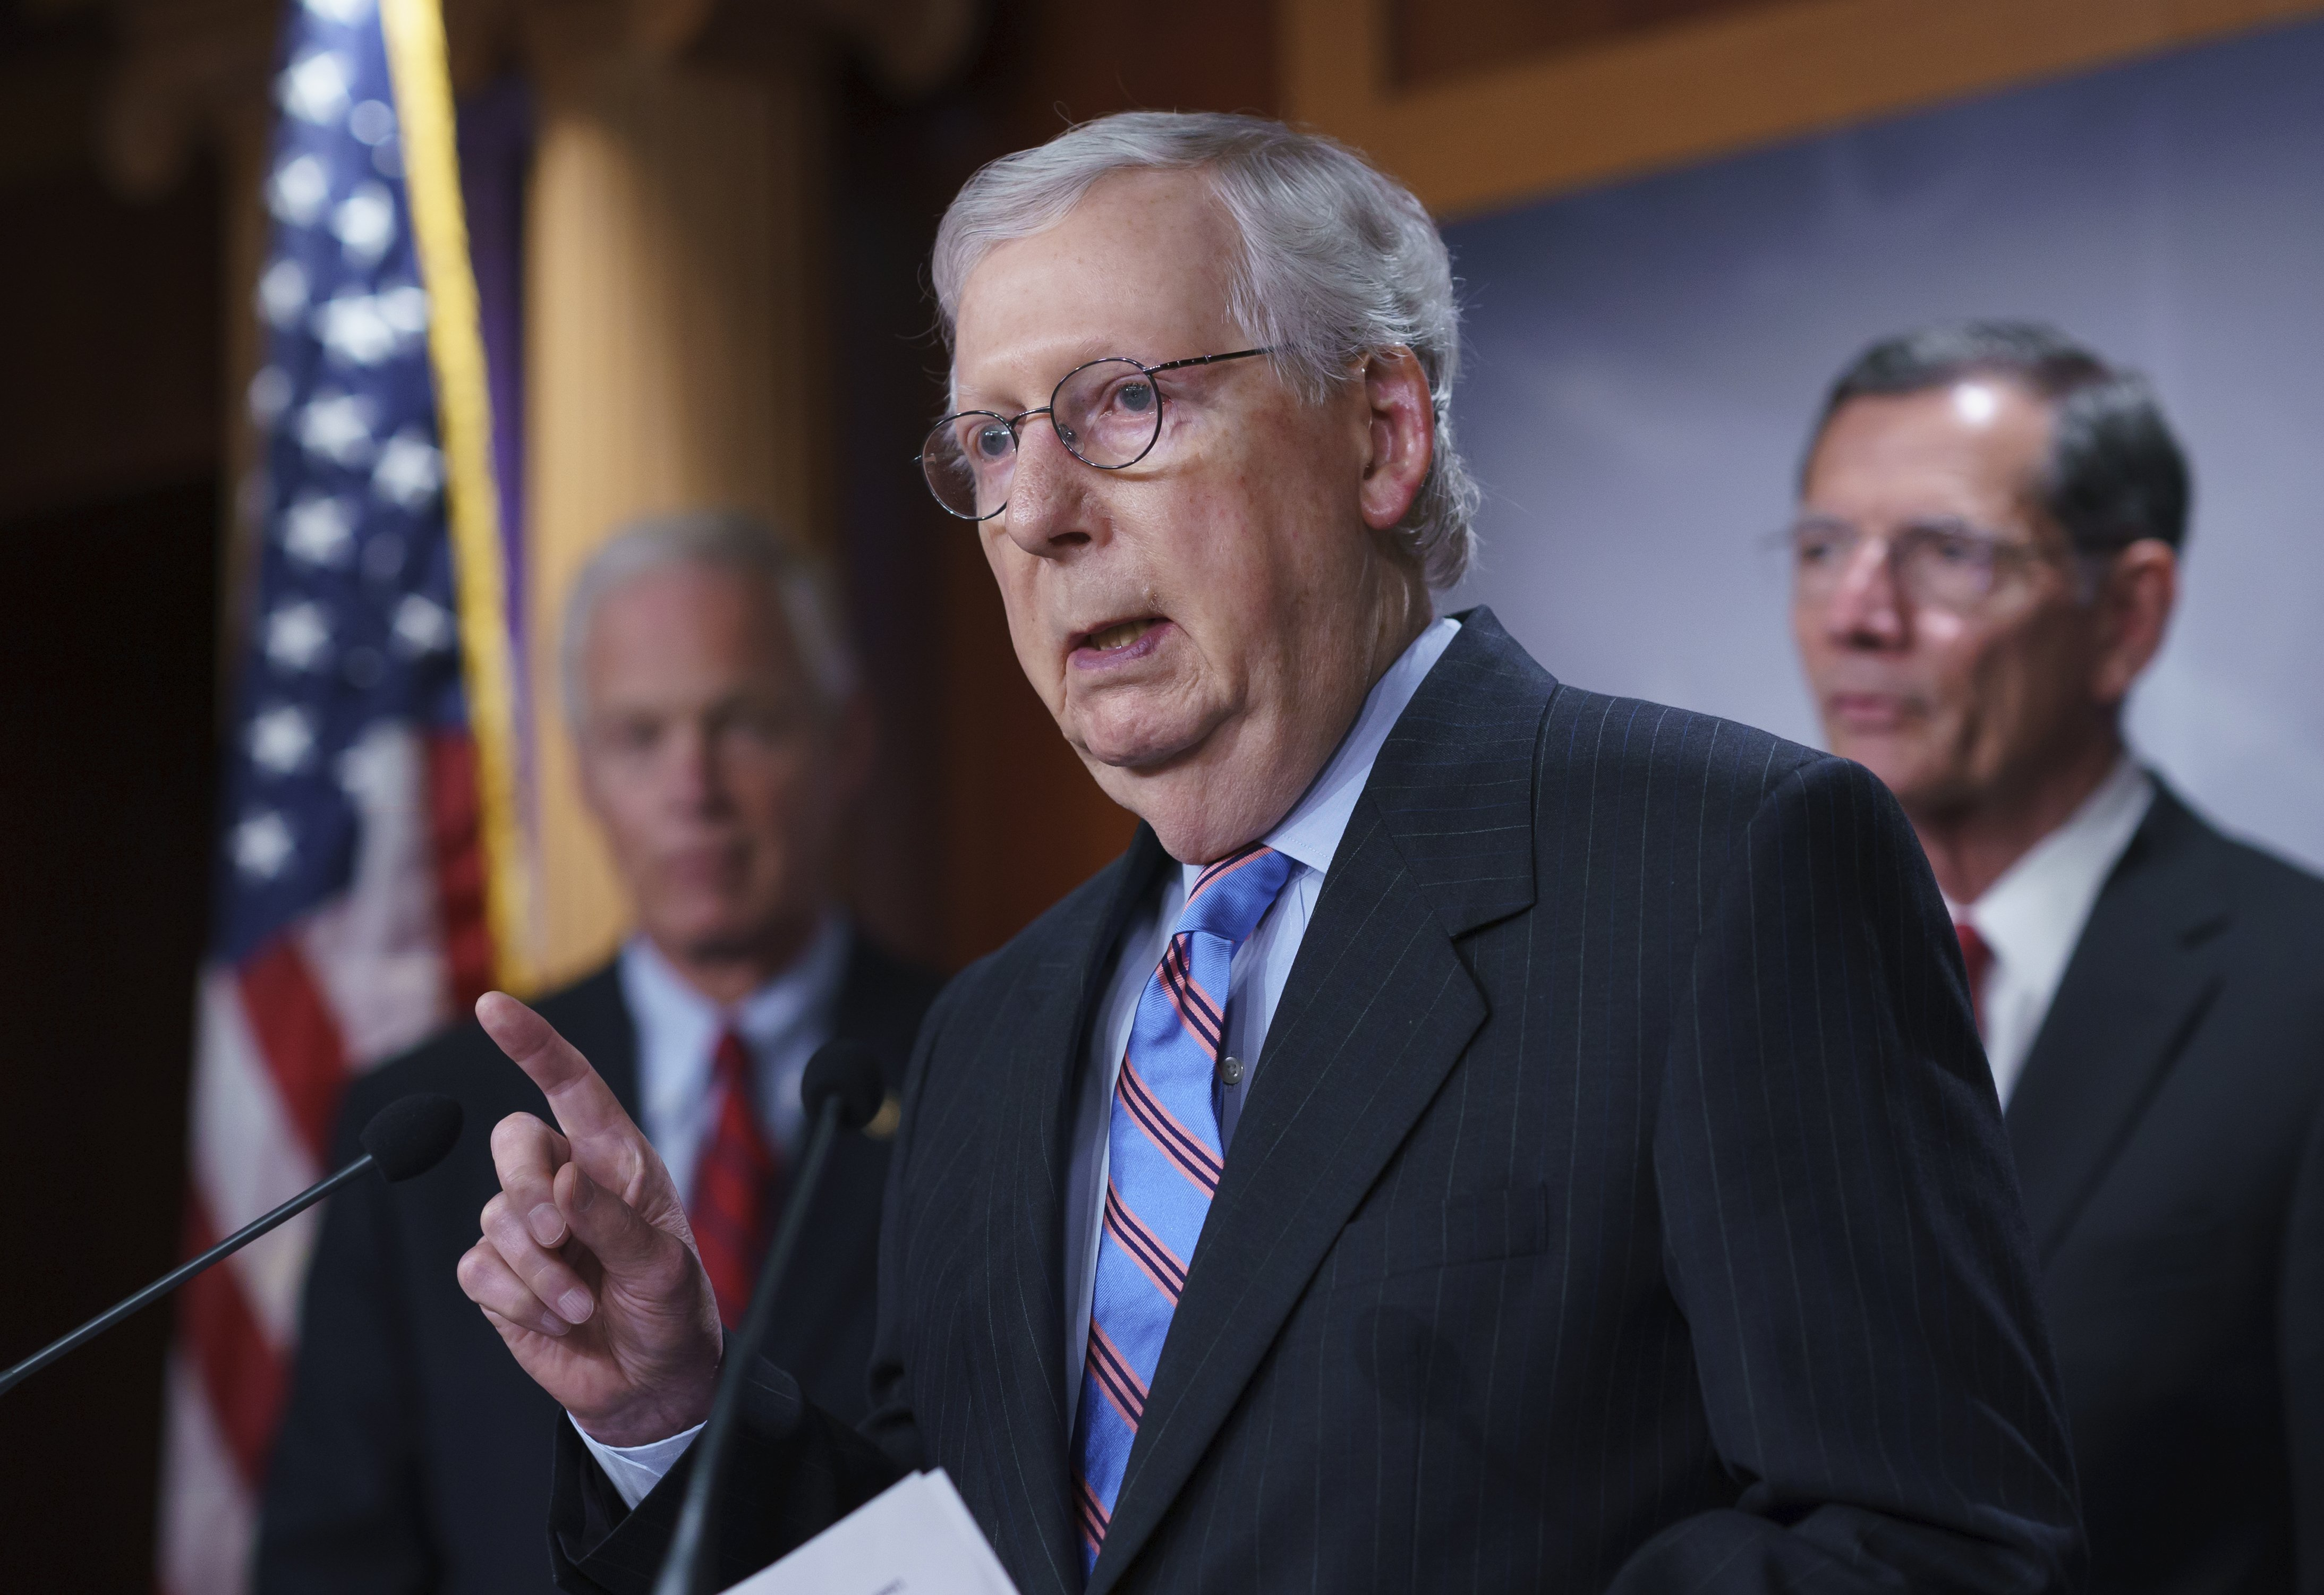 Senate Republicans rebuff consideration of bipartisan infrastructure bill